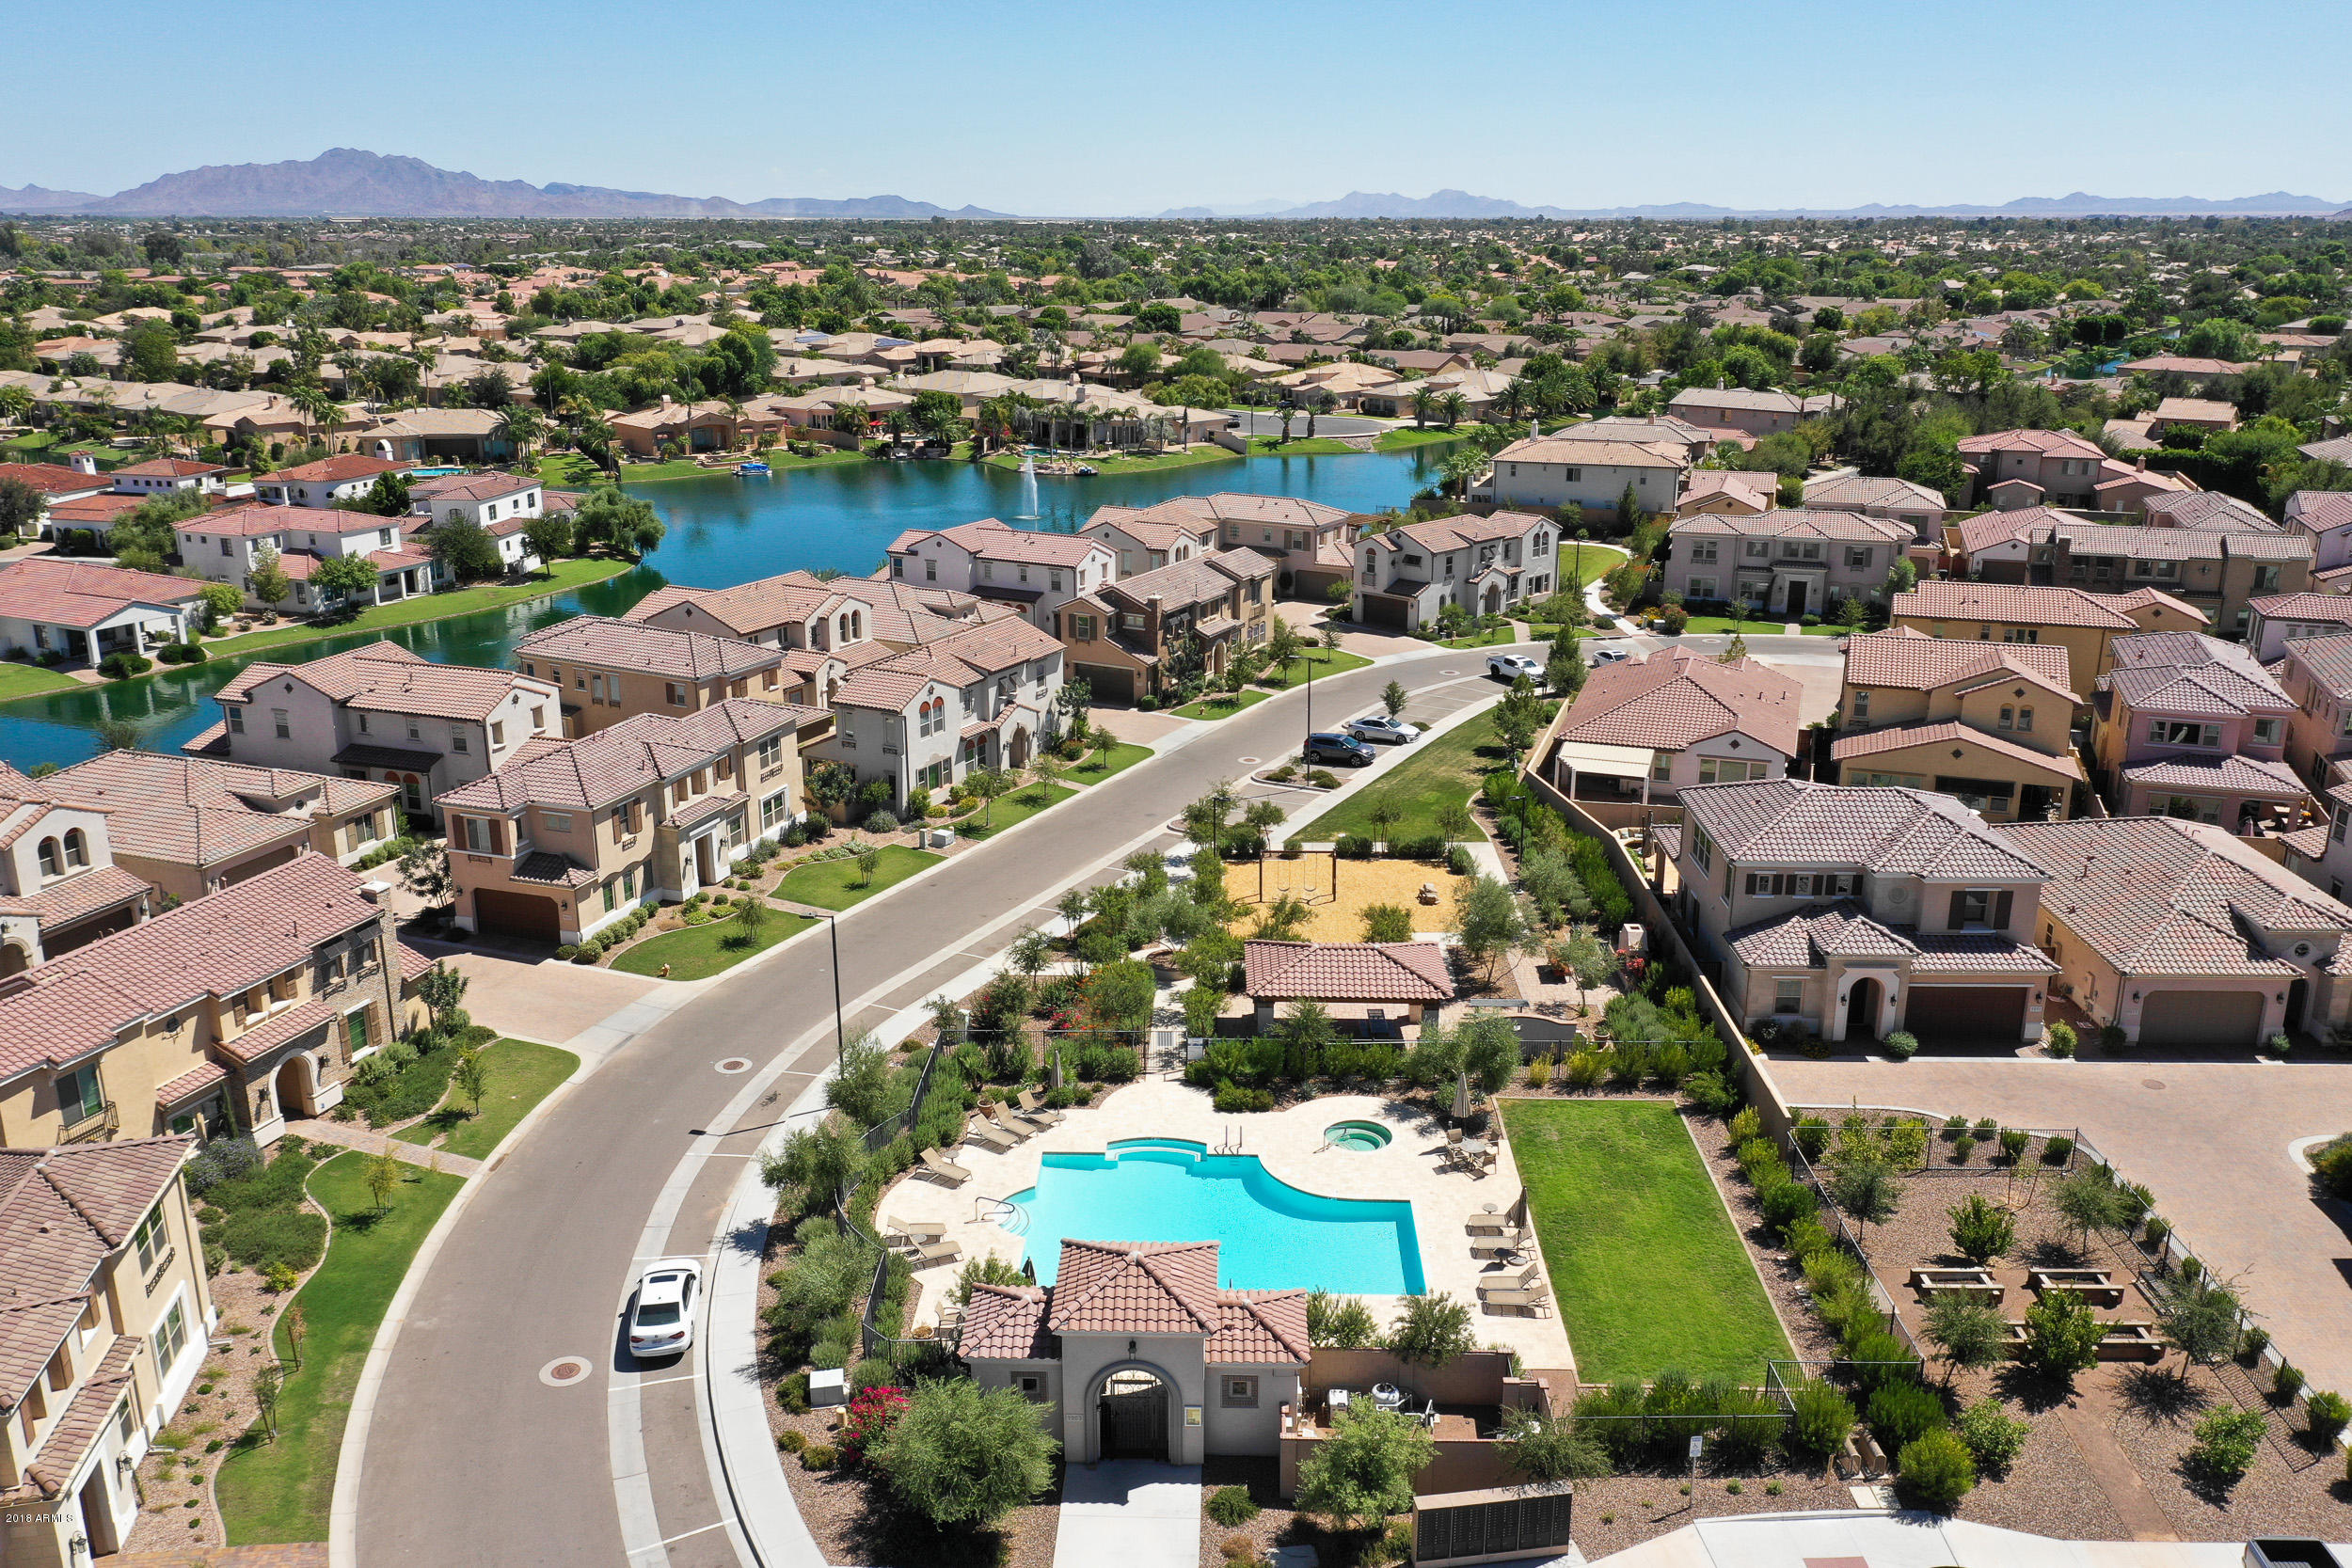 MLS 5823682 4143 S PECAN Drive, Chandler, AZ 85248 Condos